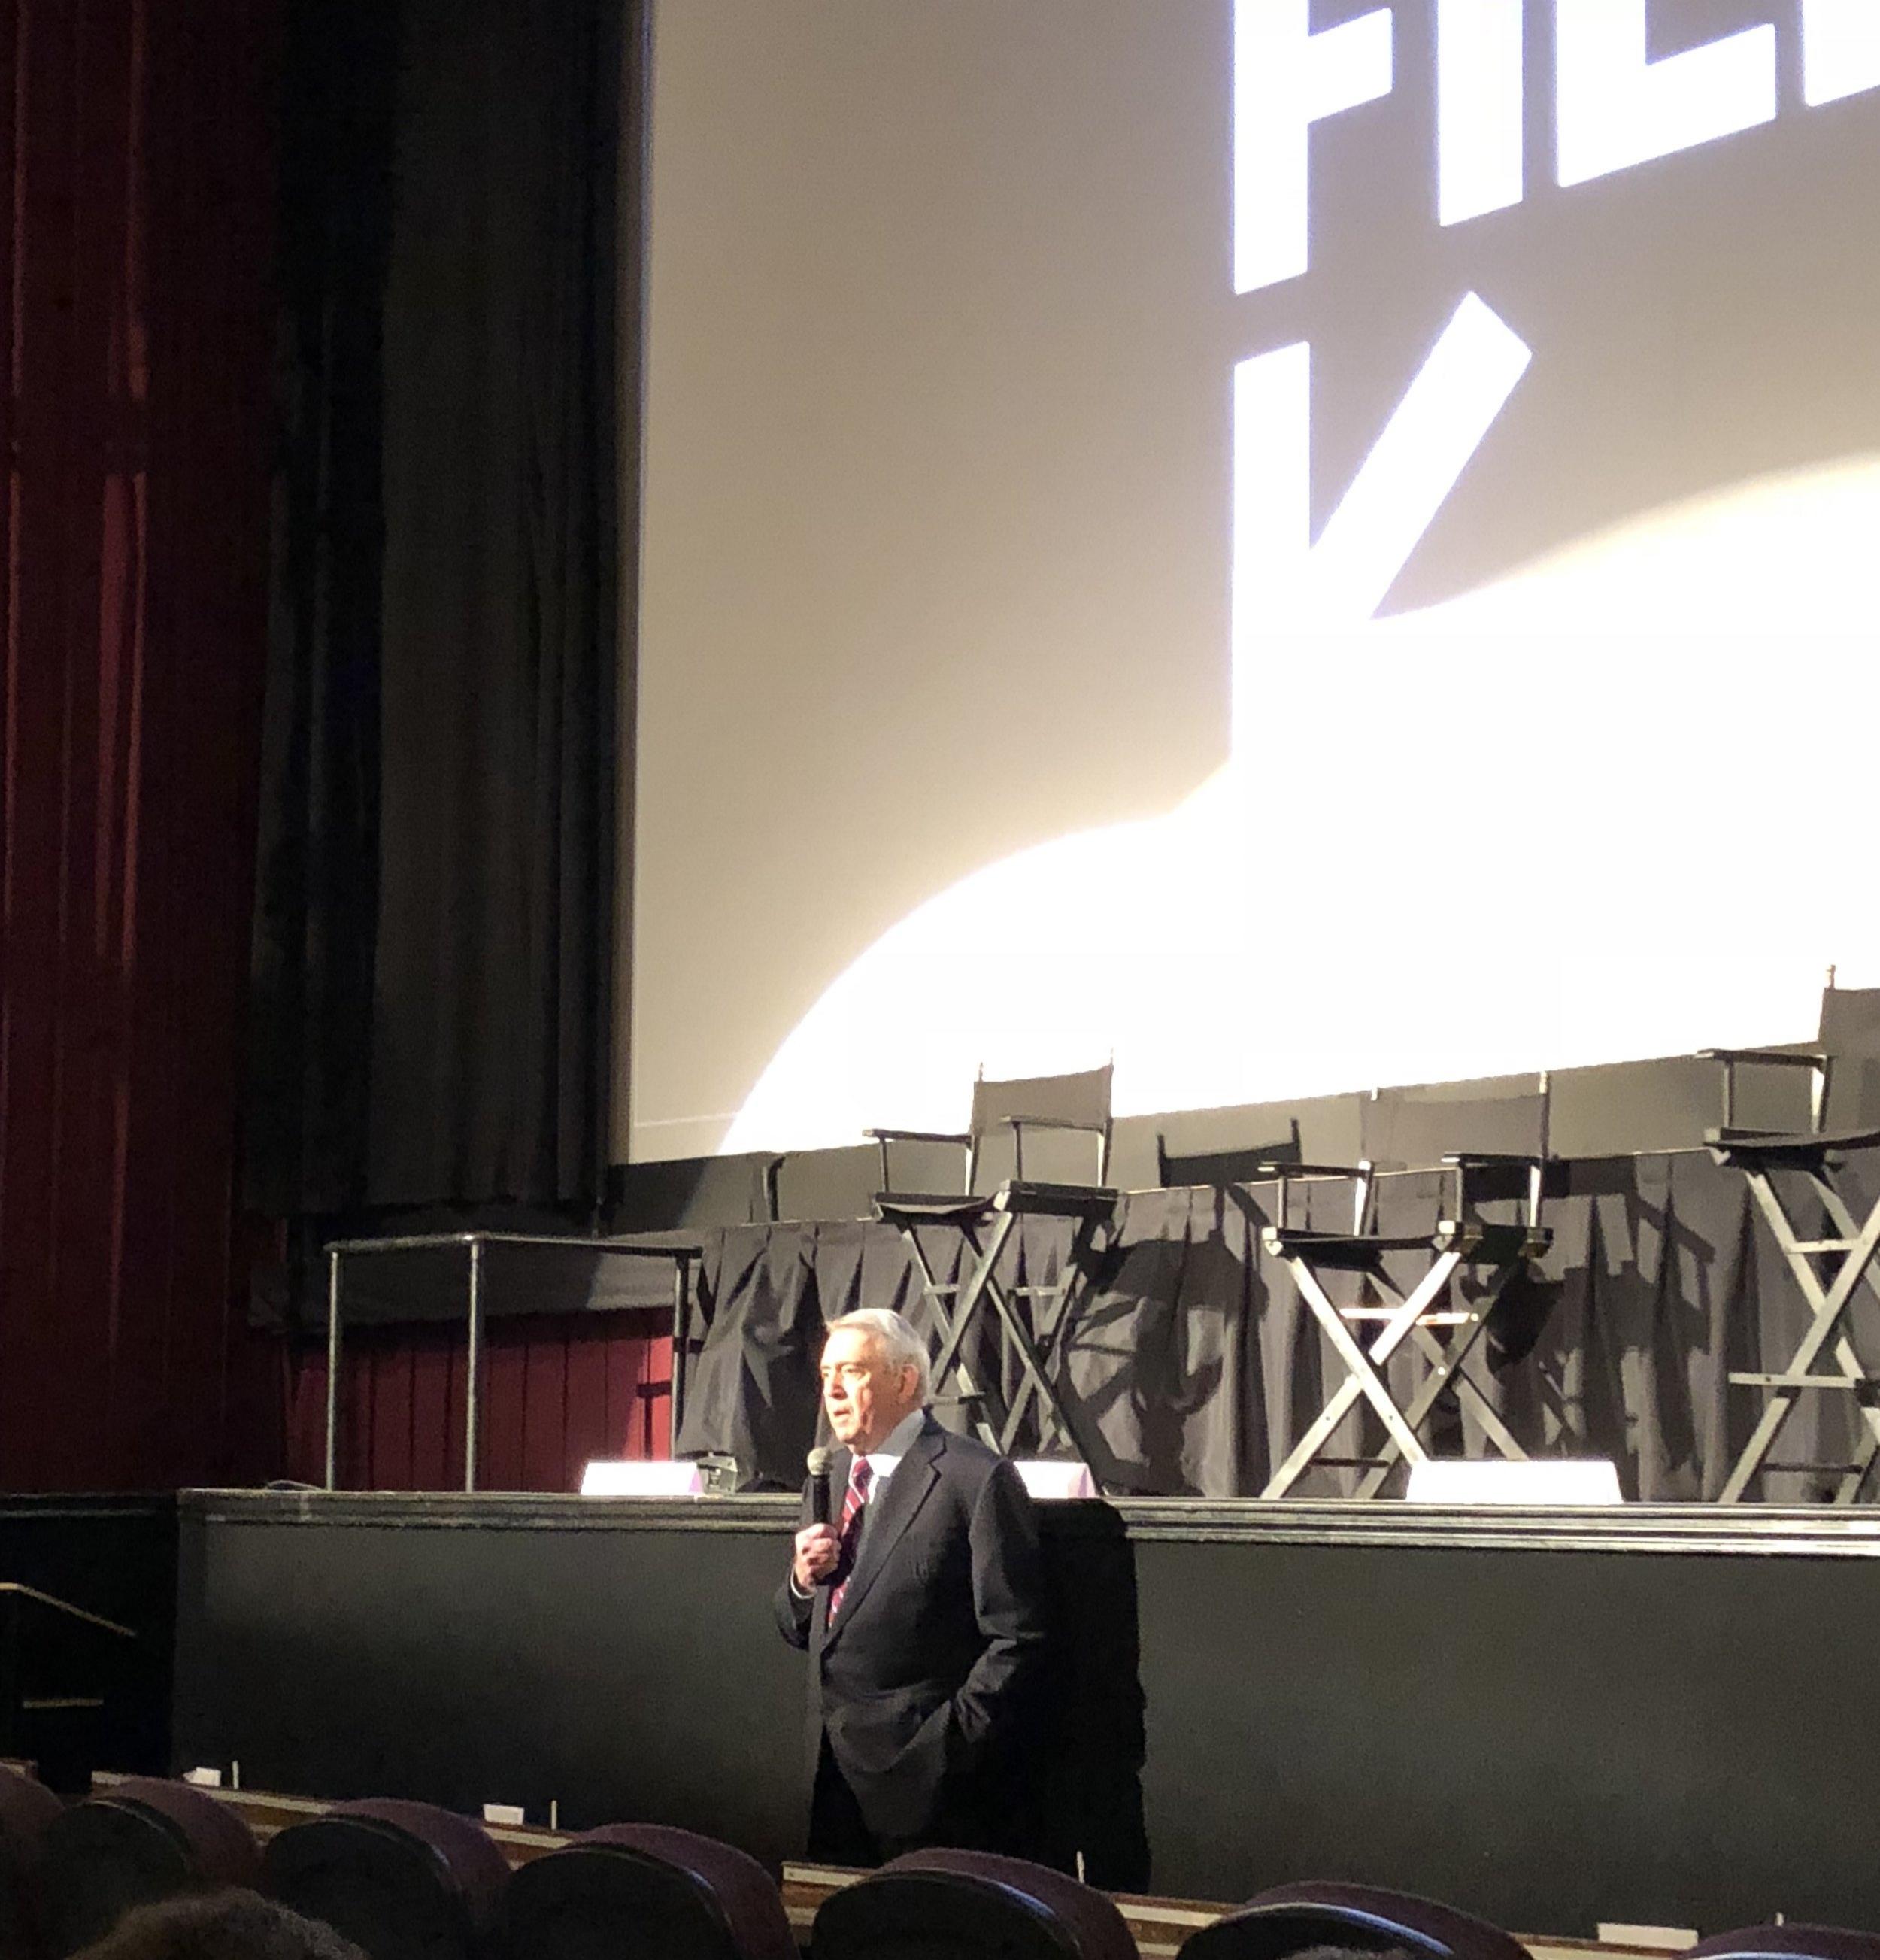 Dan Rather introduces the film.